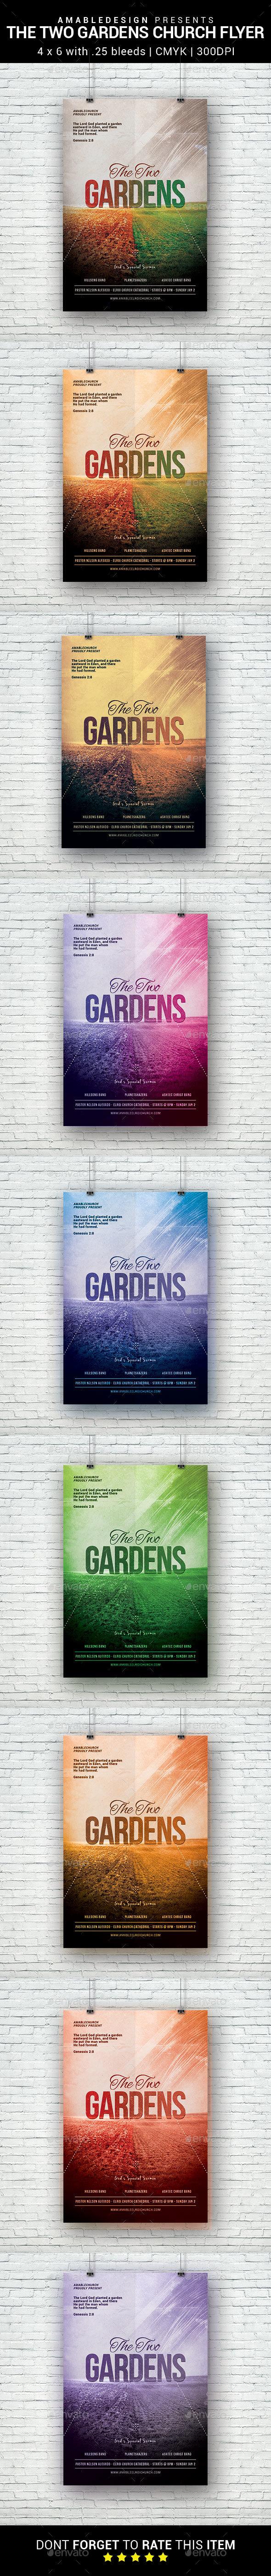 The Two Gardens Church Flyer - Church Flyers